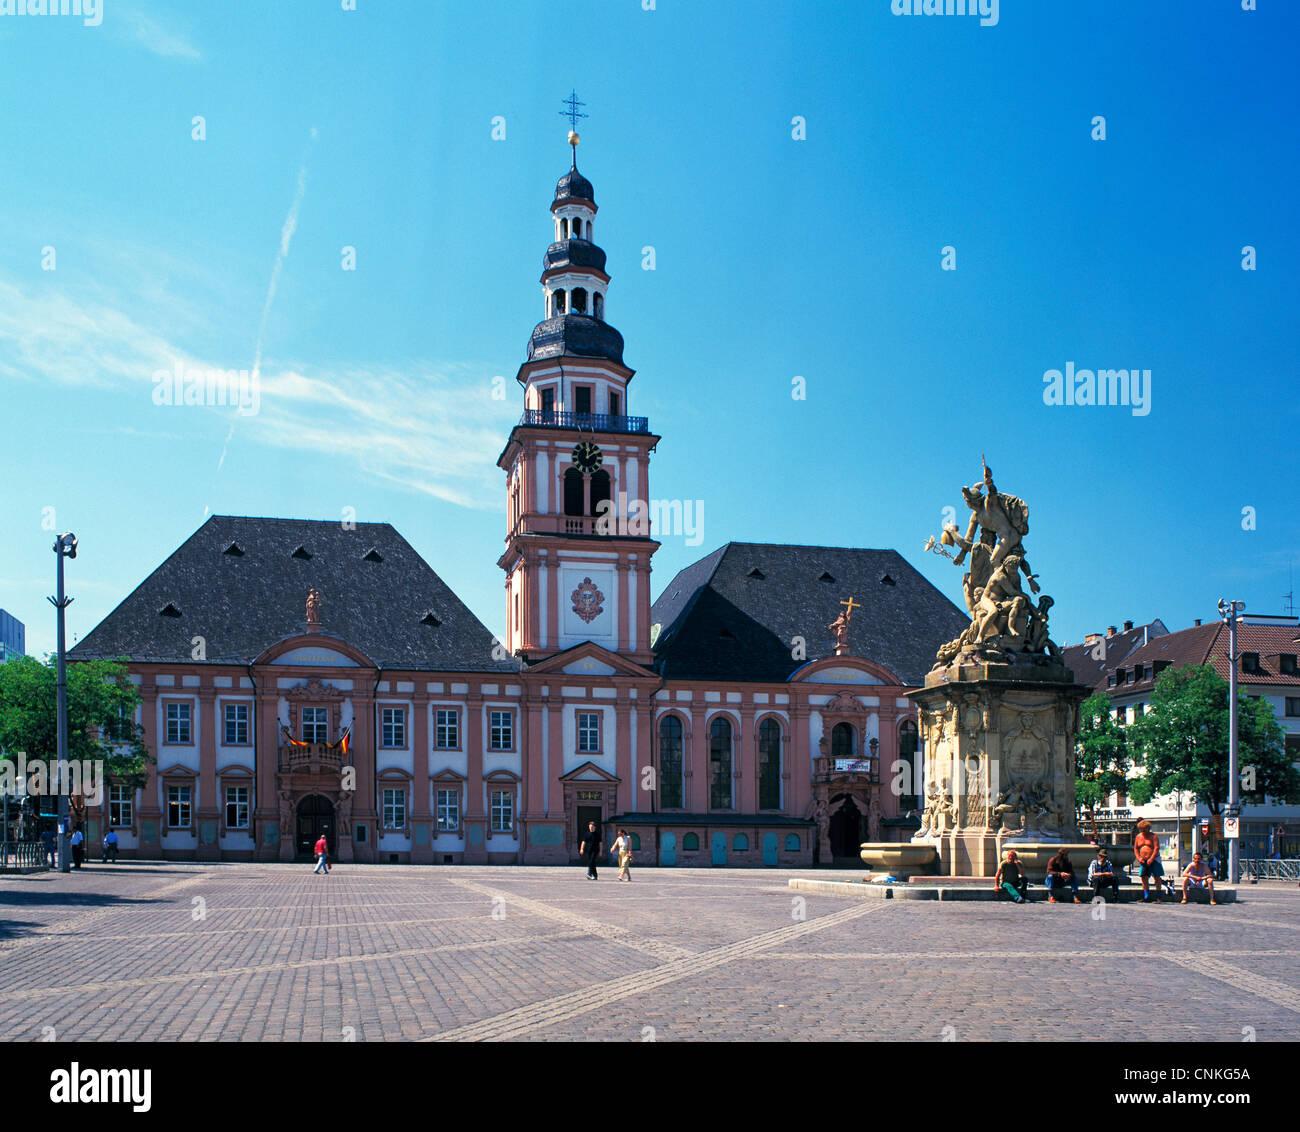 8c4474c1ef Germany Van Stock Photos   Germany Van Stock Images - Alamy